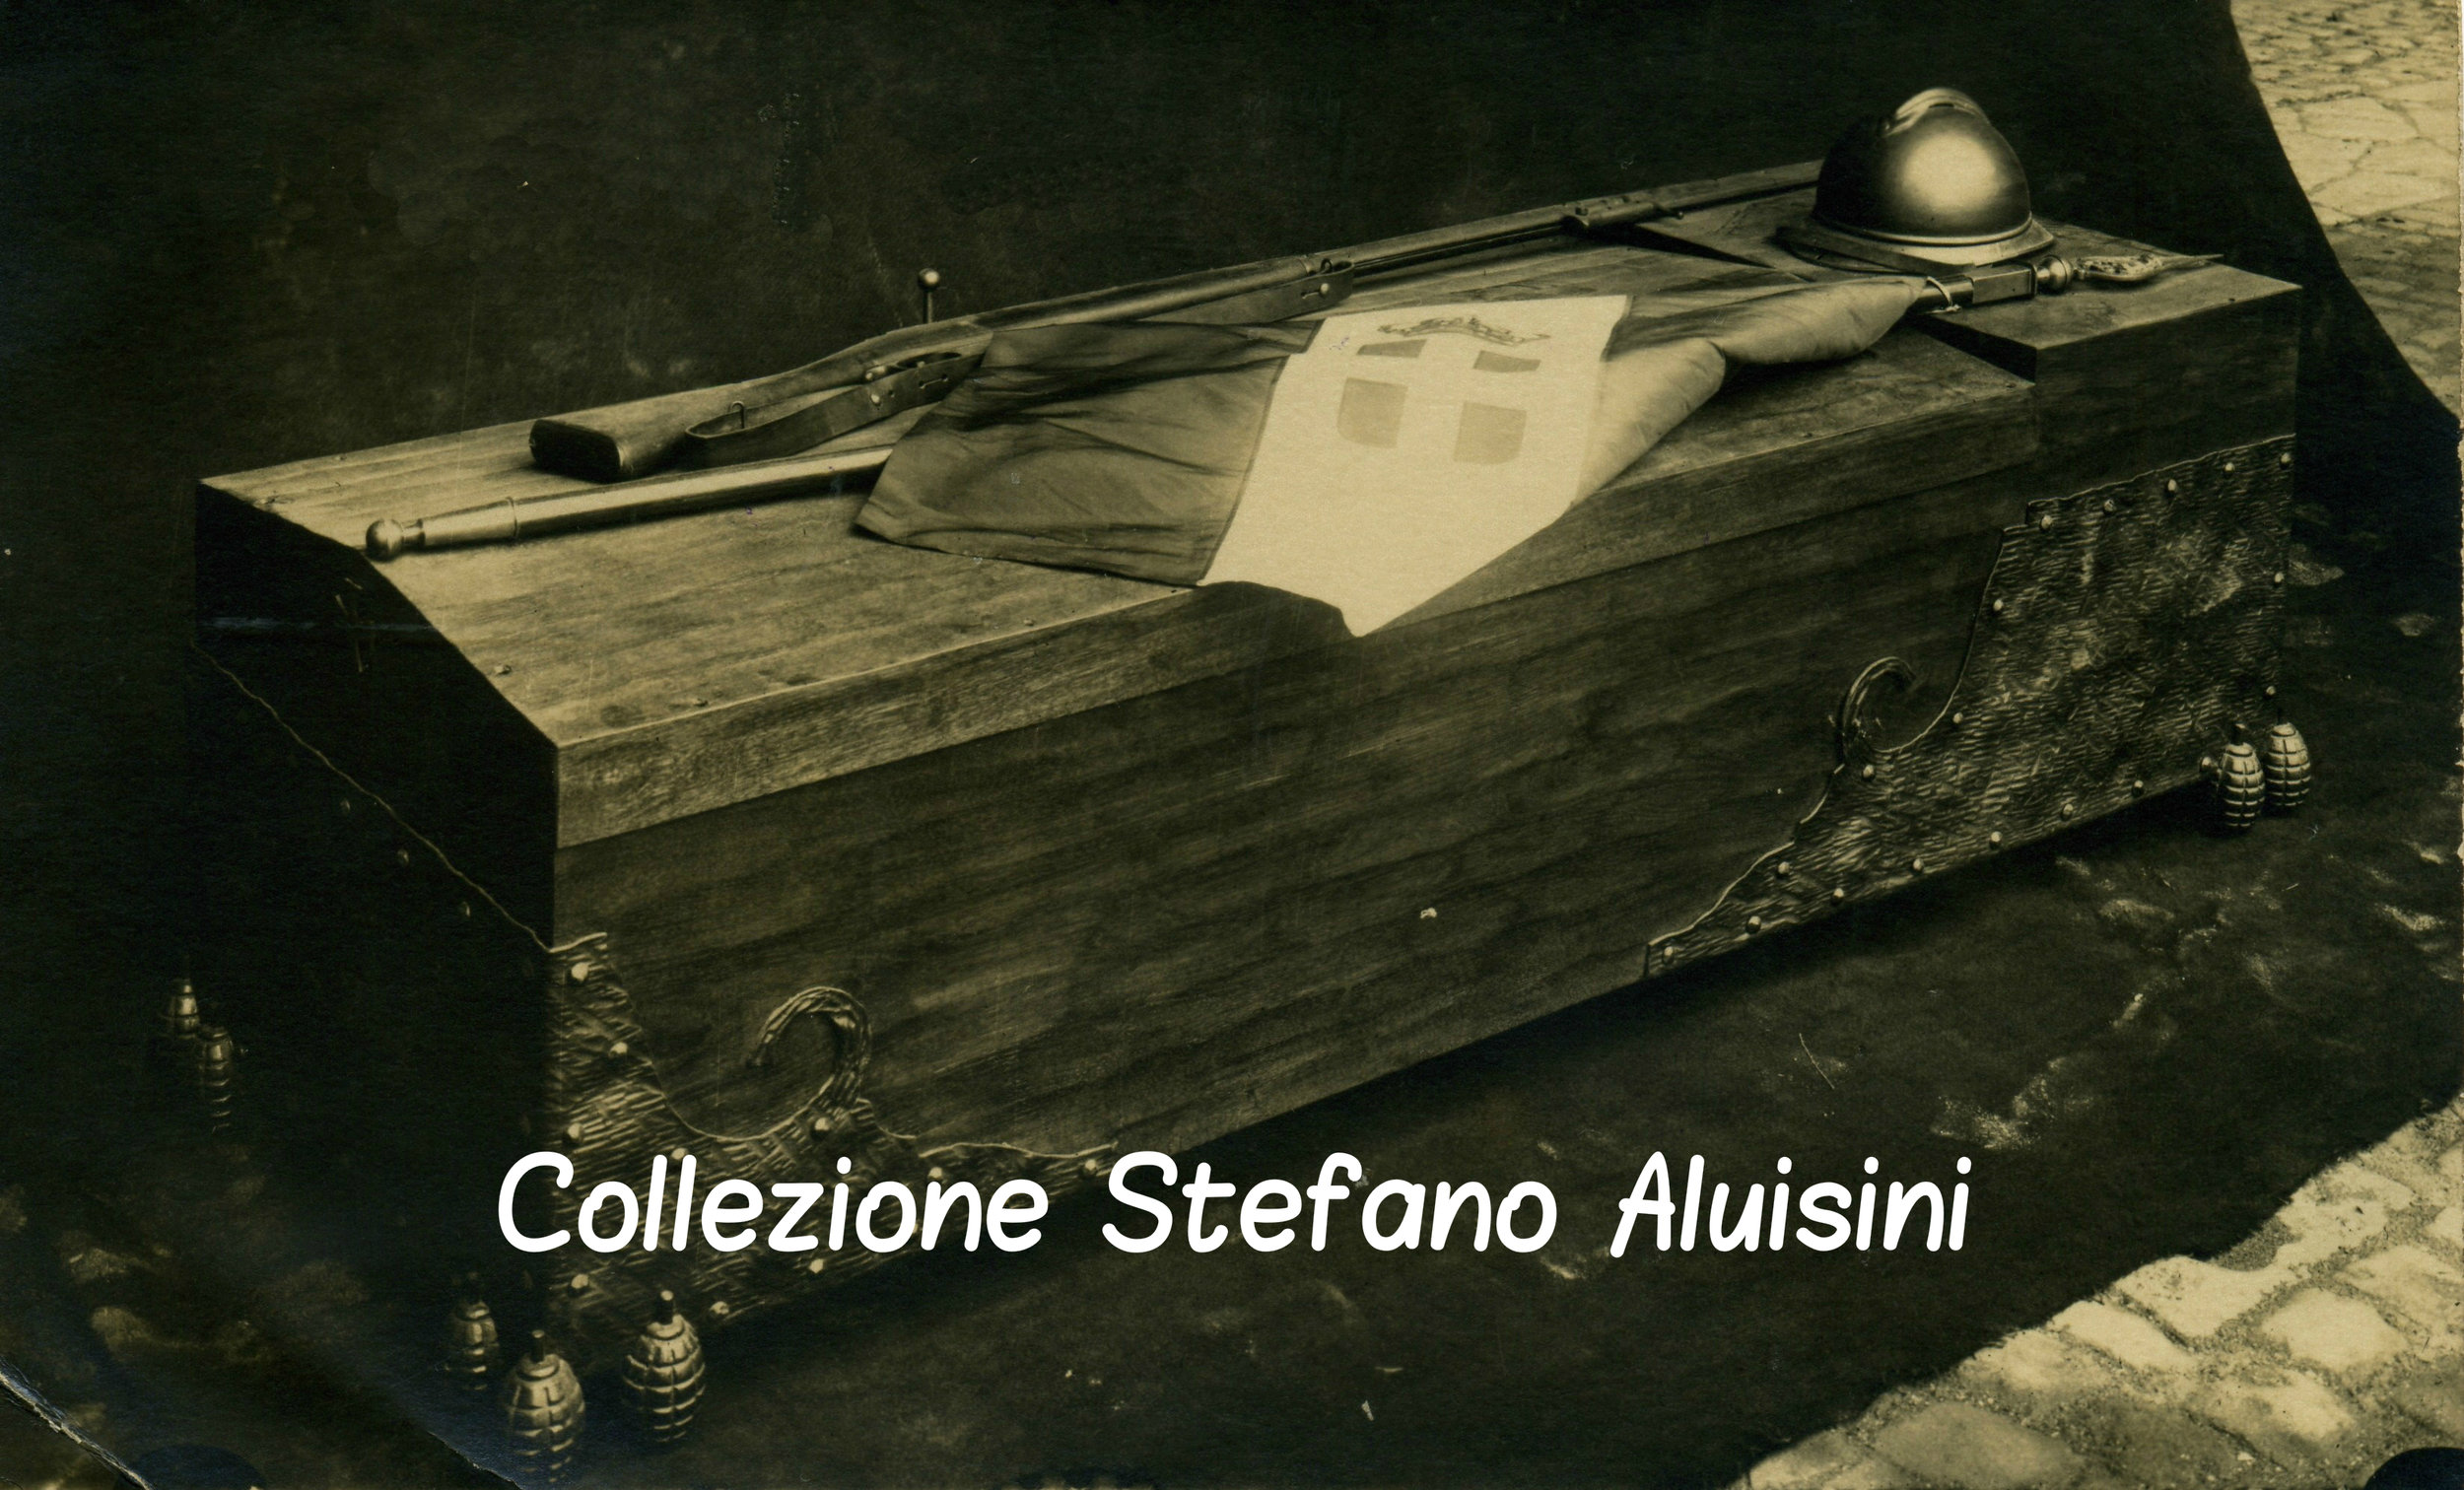 036 sarcofago milite ignoto.jpg